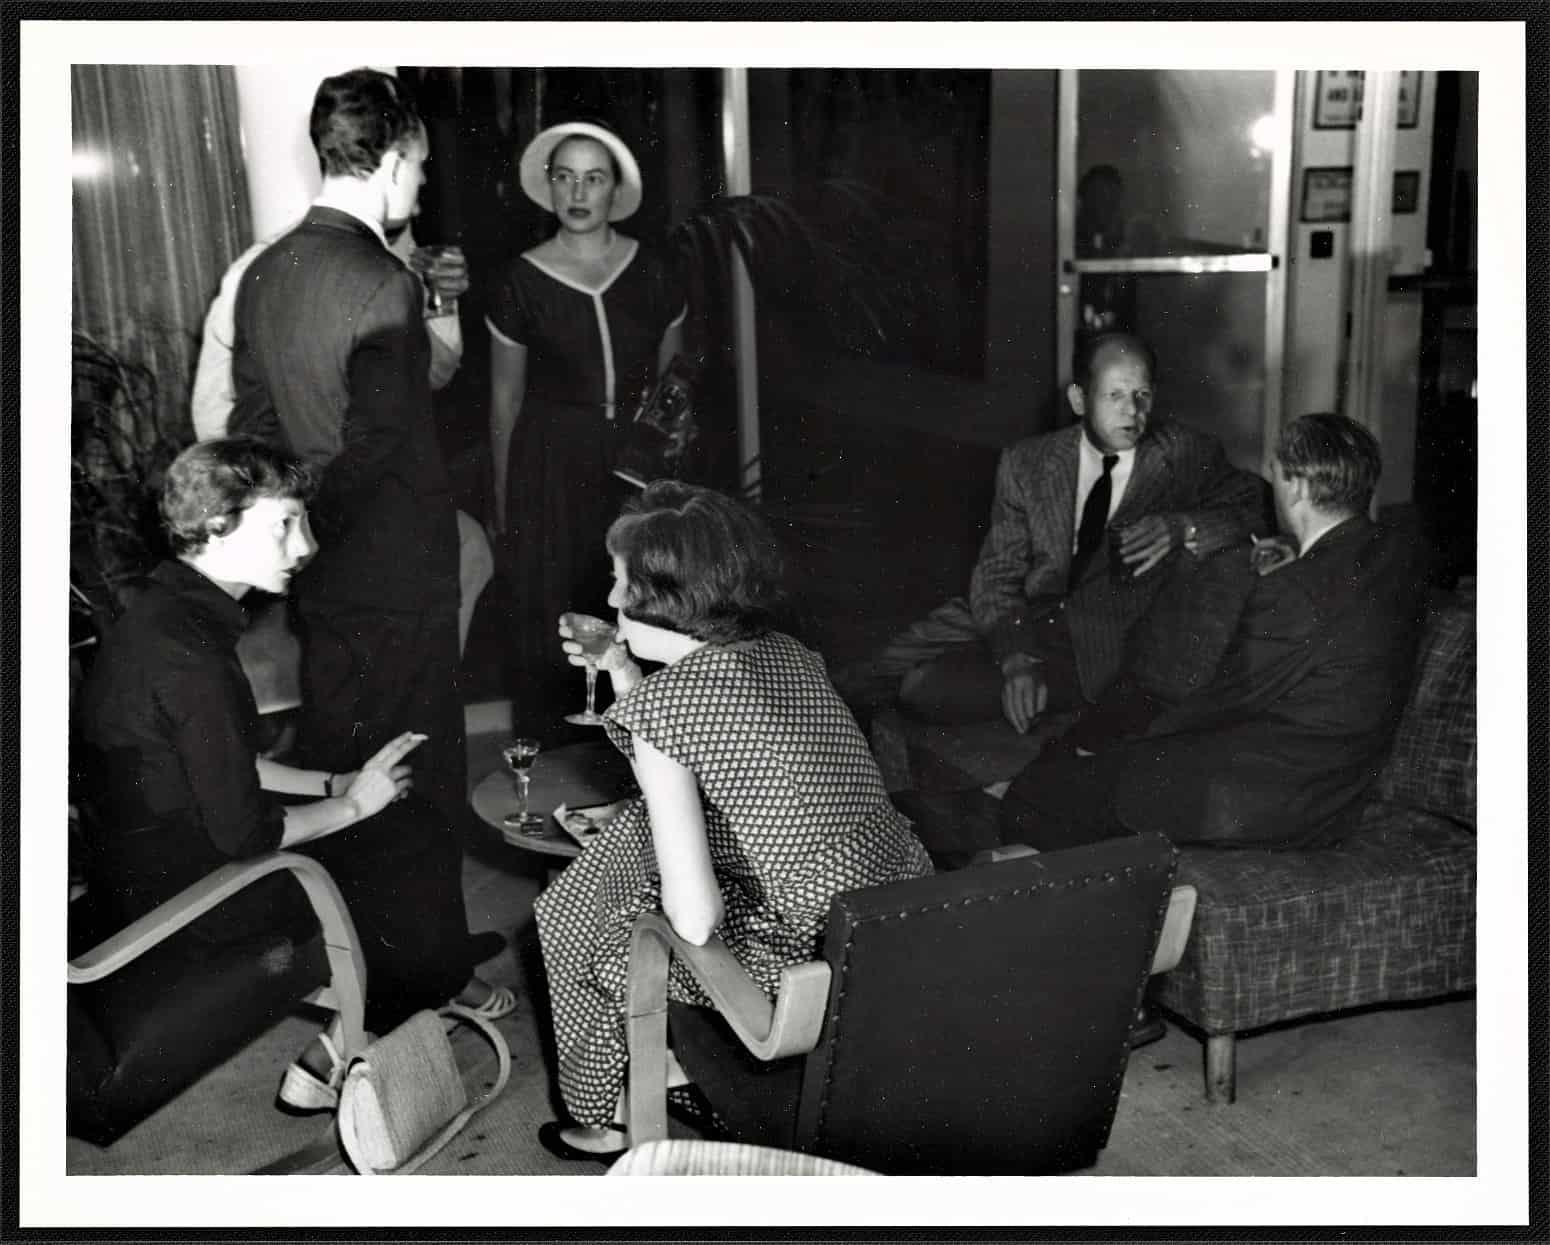 Seated from left: Elaine de Kooning, Lee Krasner, Willem de Kooning, and Jackson Pollock at the Museum of Modern Art, ca. 1950